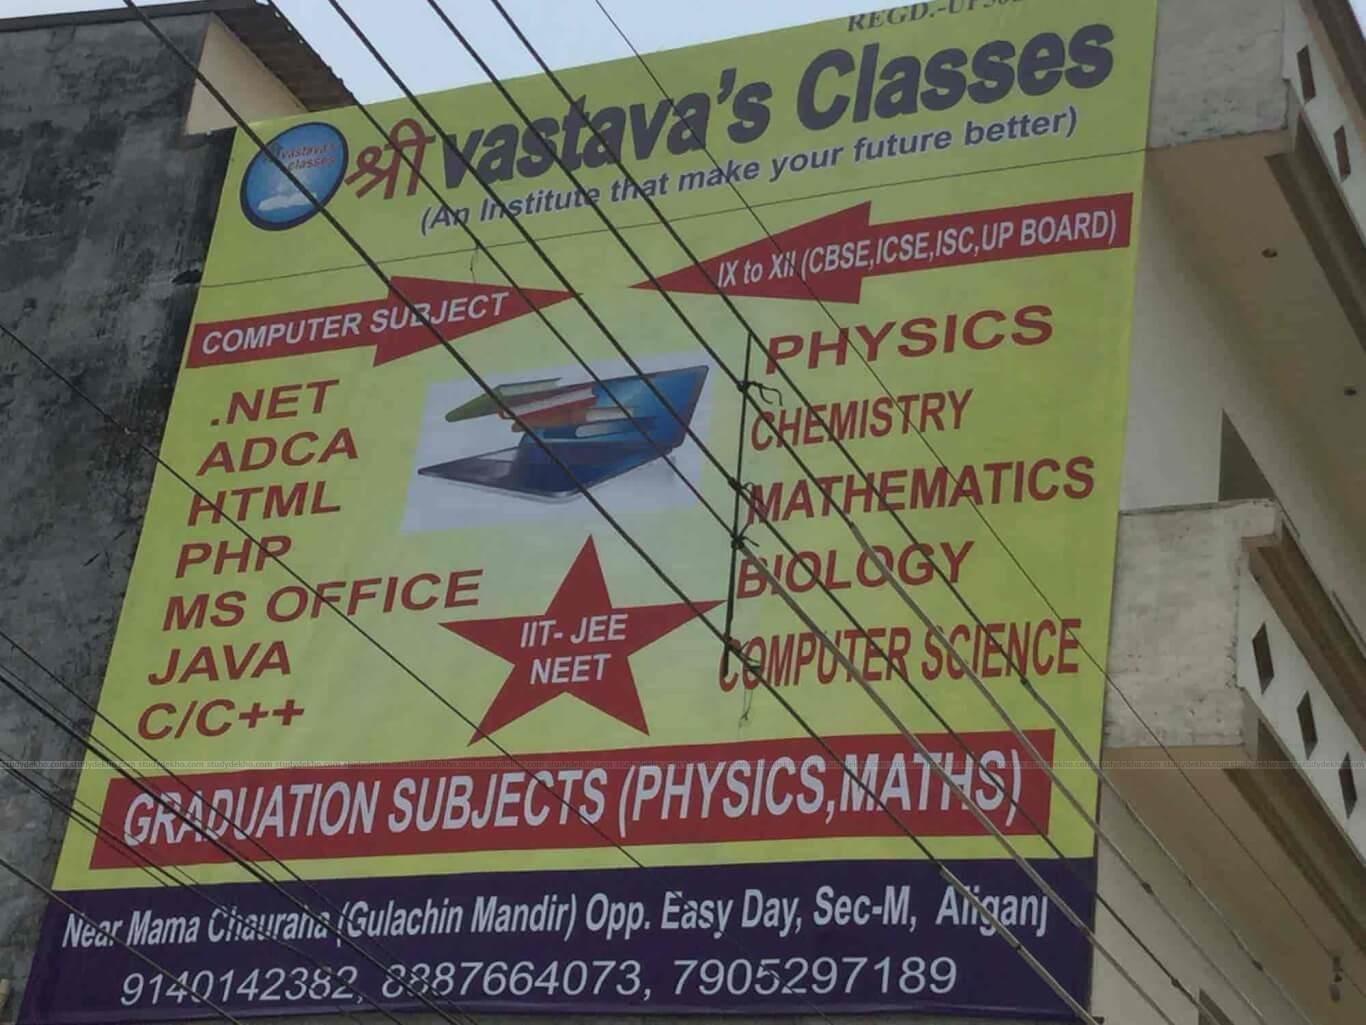 SRIVASTAVA'S CLASSES Logo